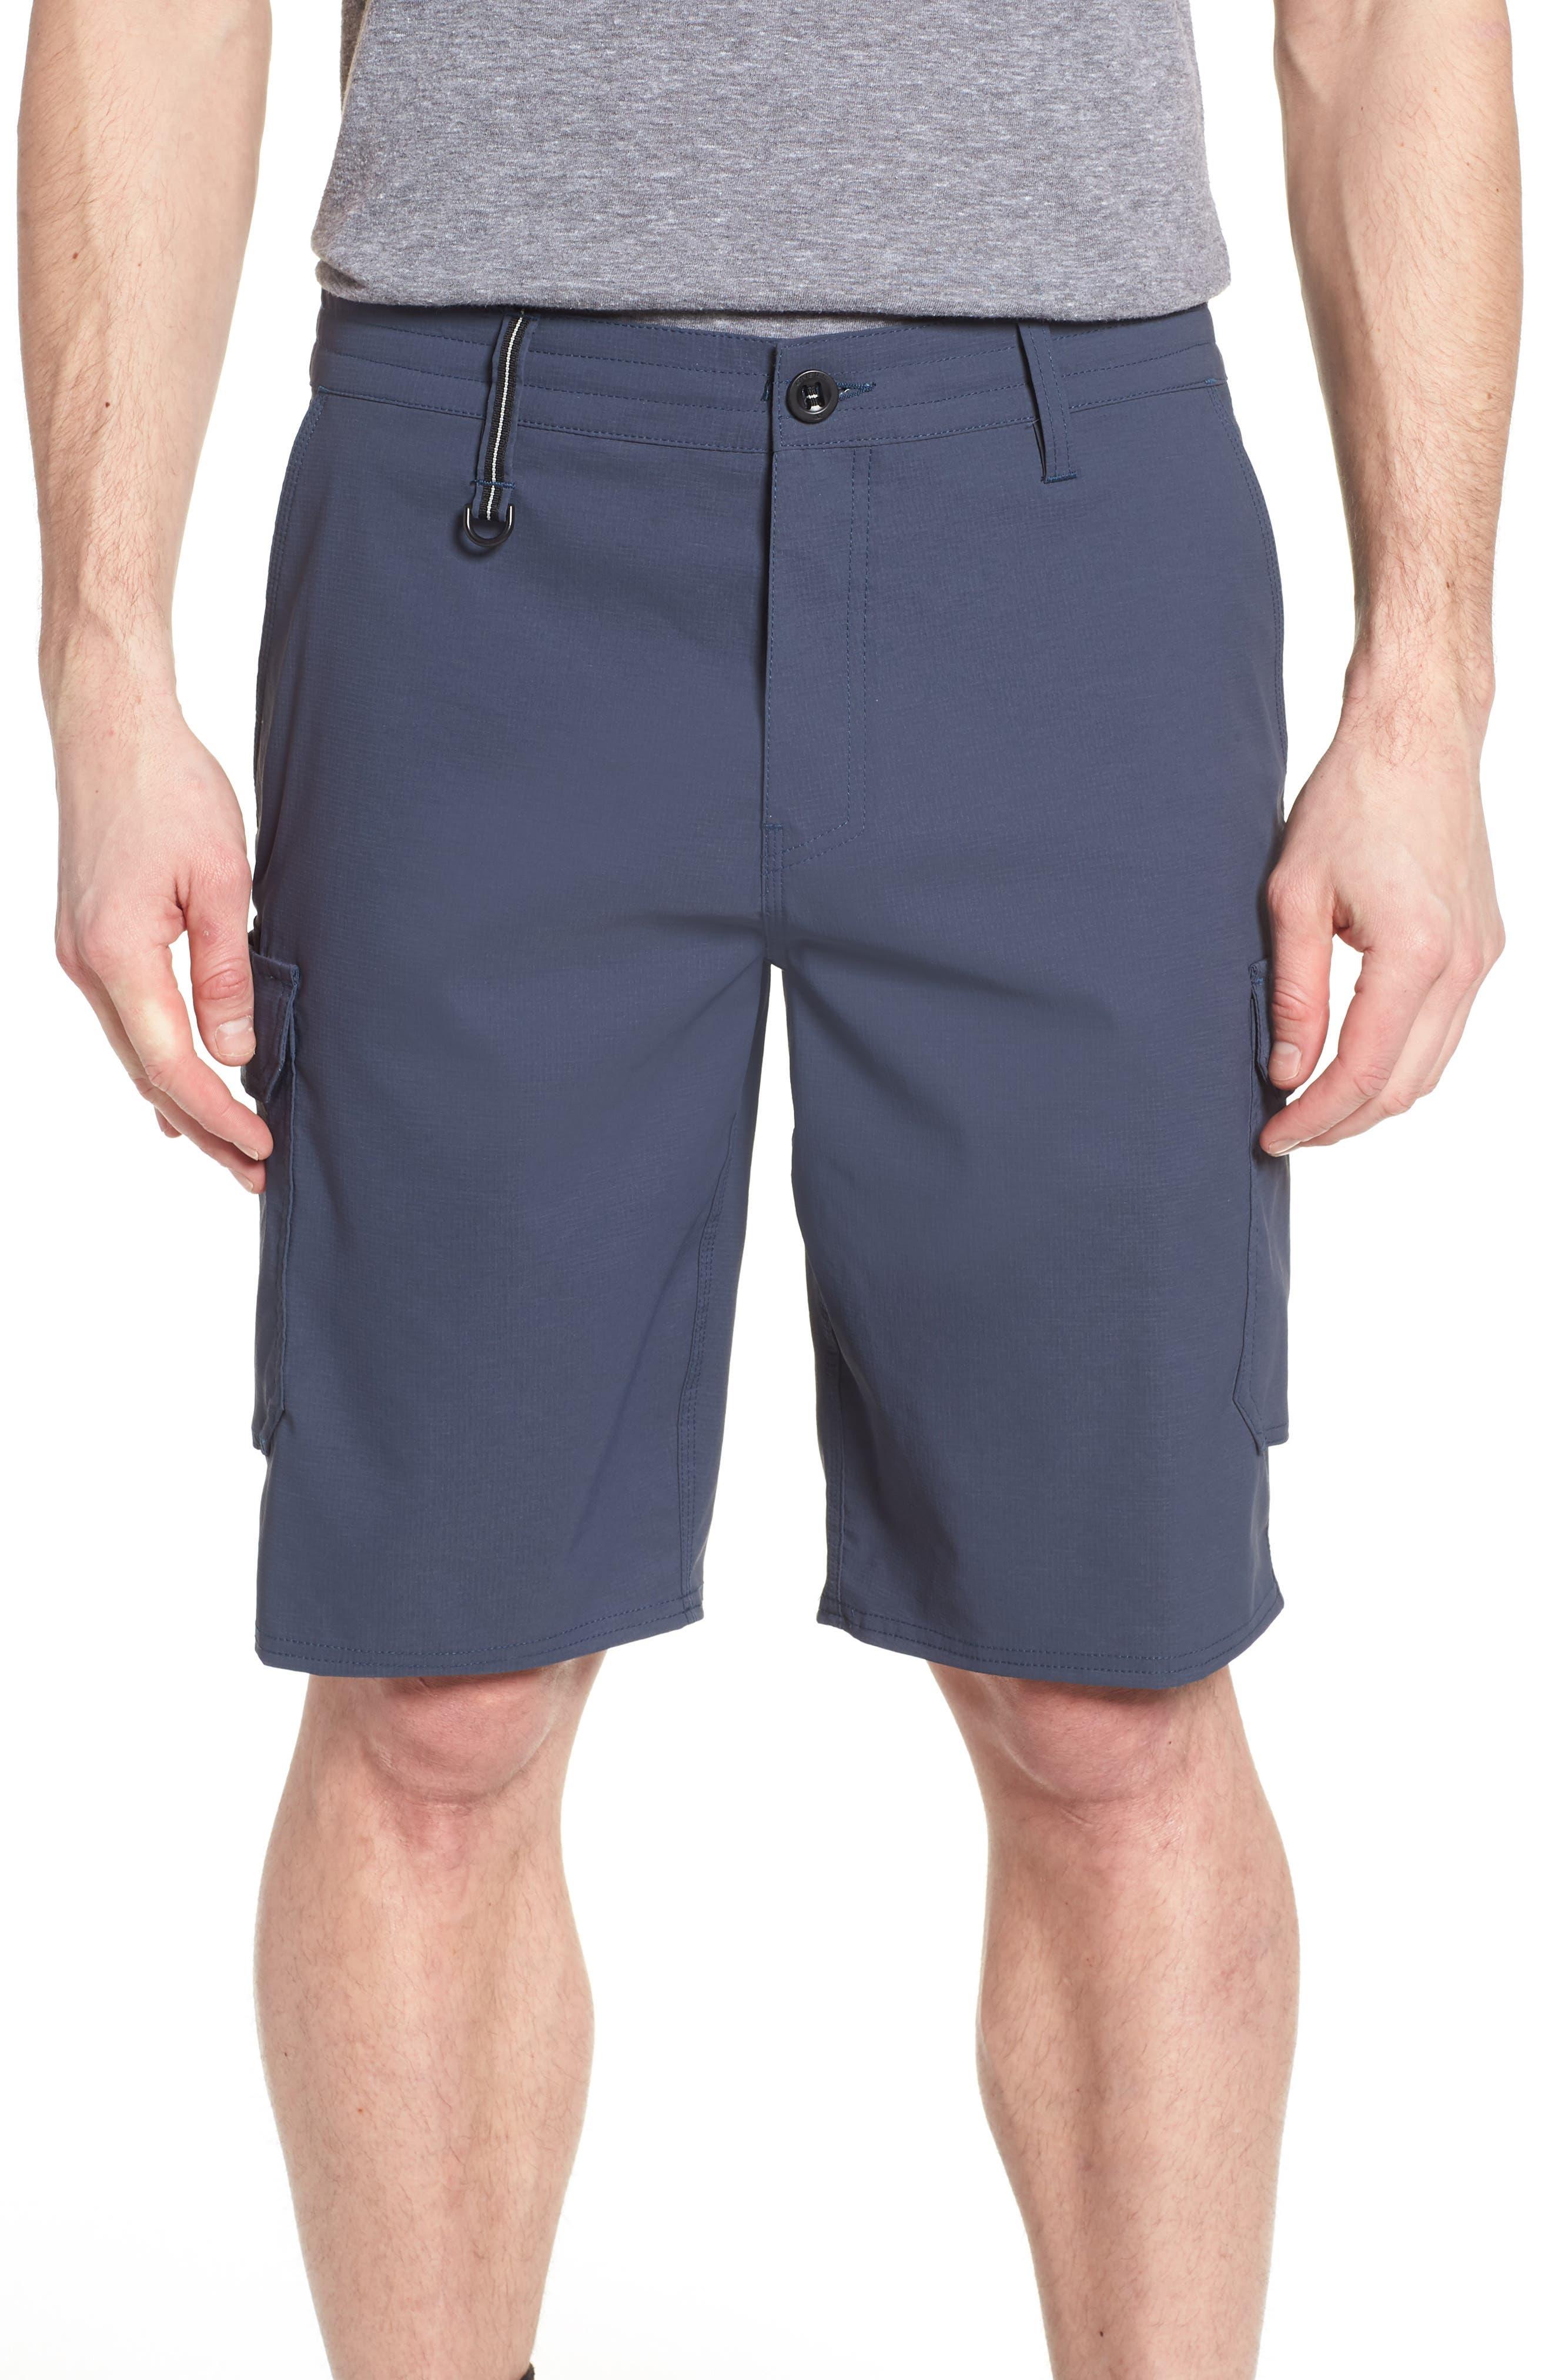 Traveler Cargo Board Shorts,                         Main,                         color, Slate